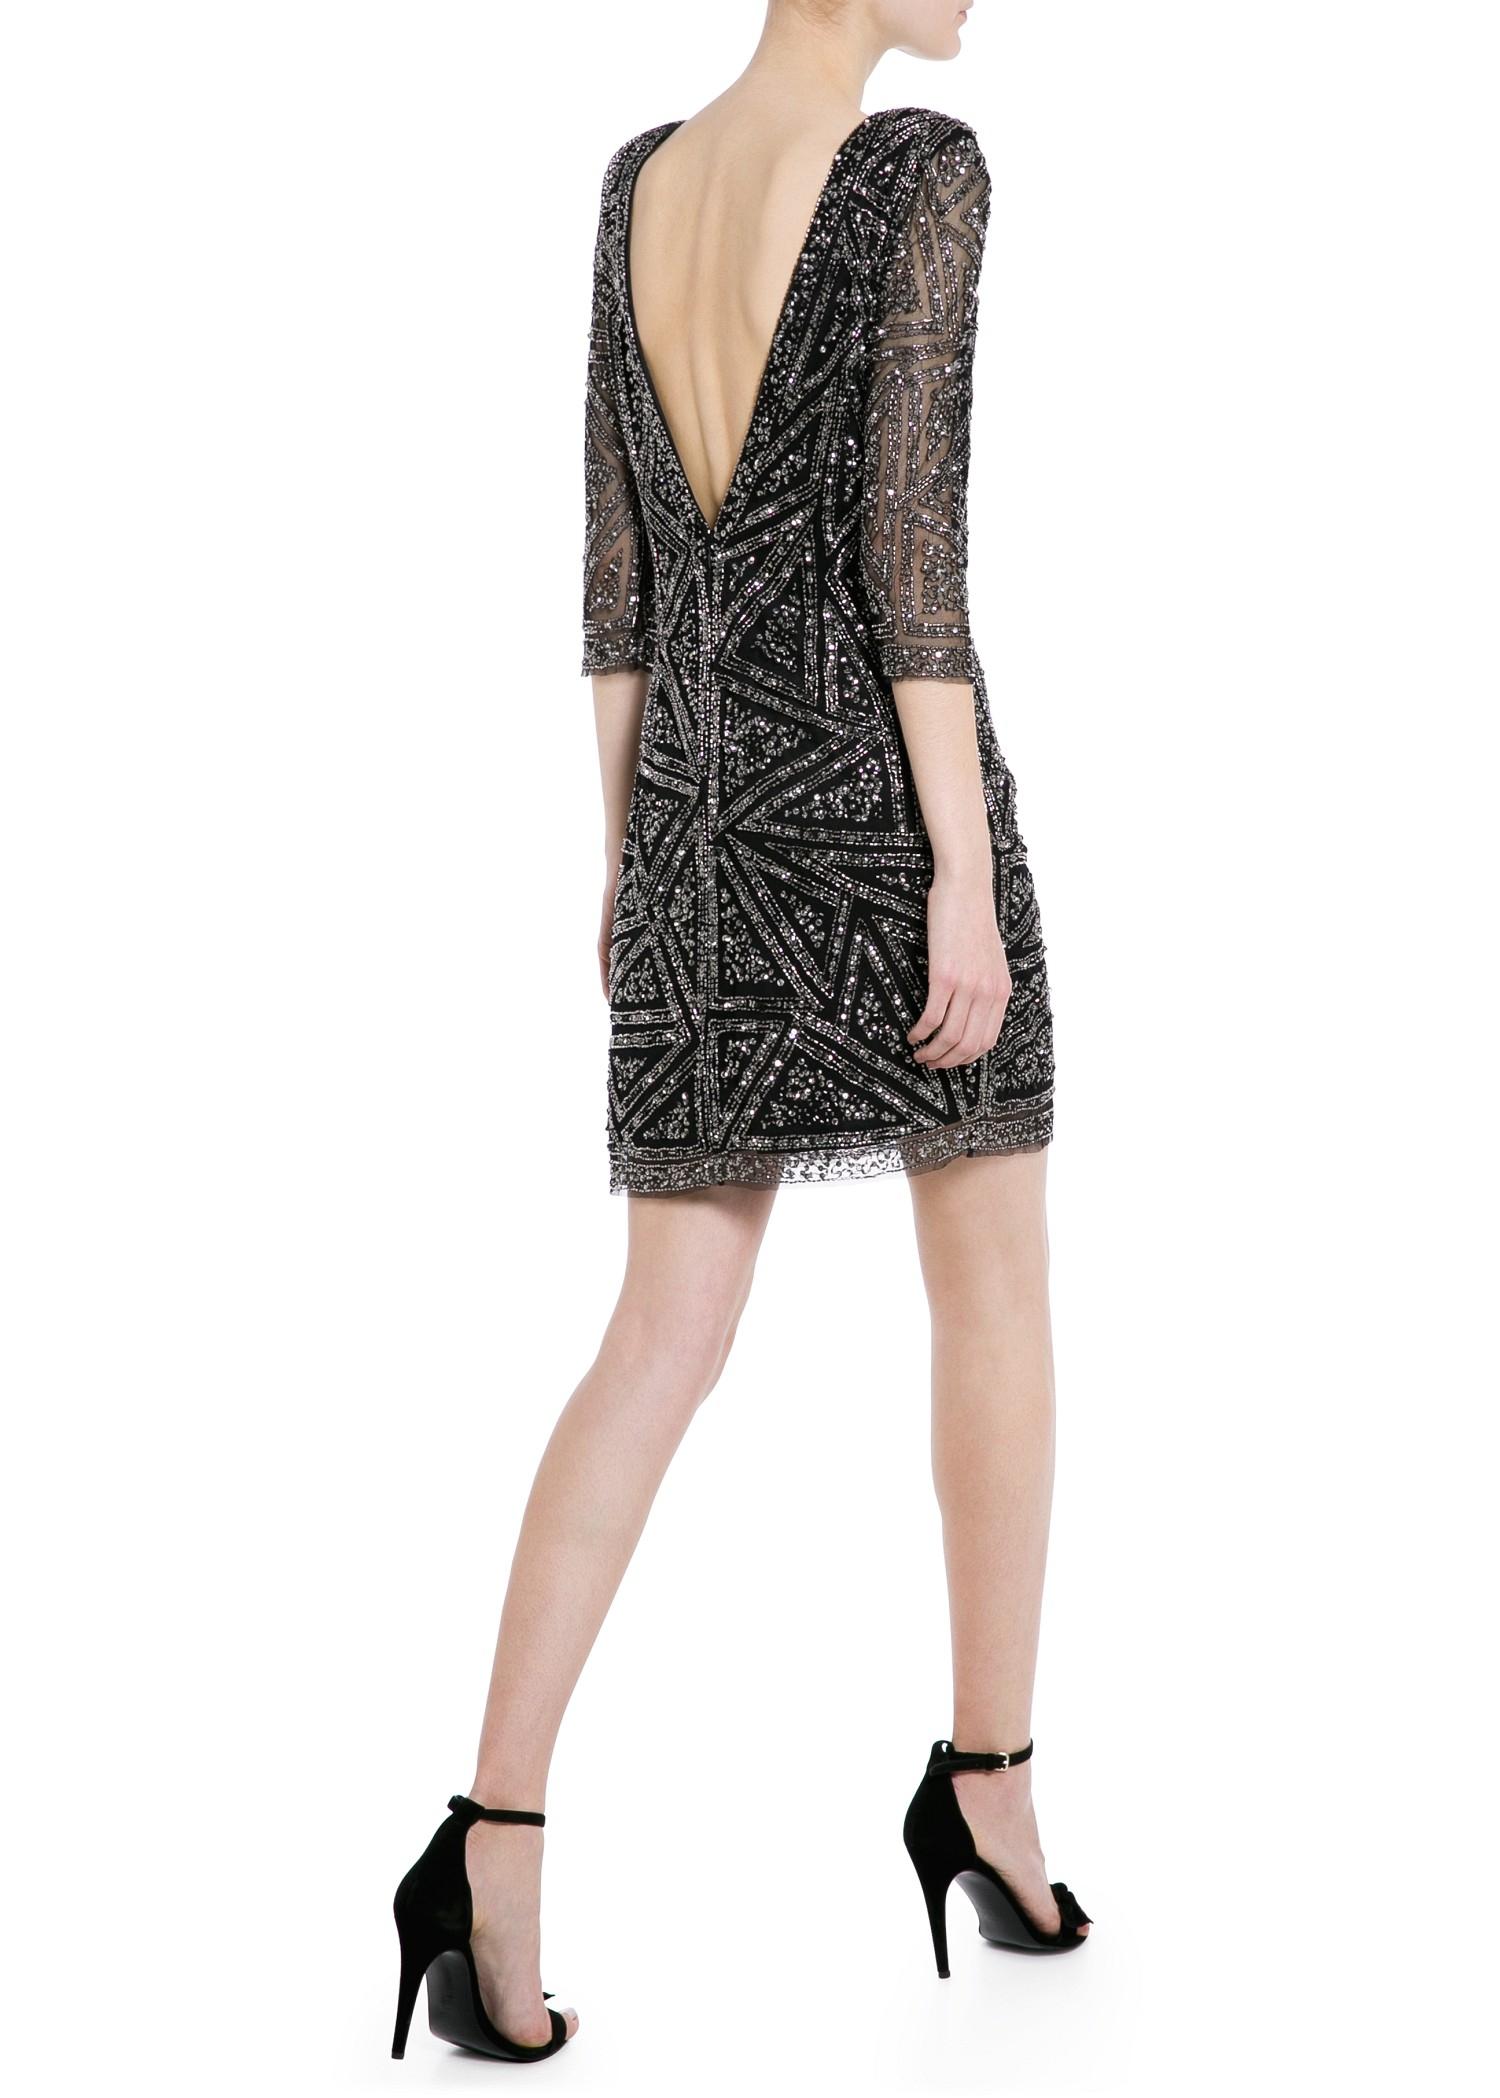 Mango Beaded Sequin Dress in Black | Lyst